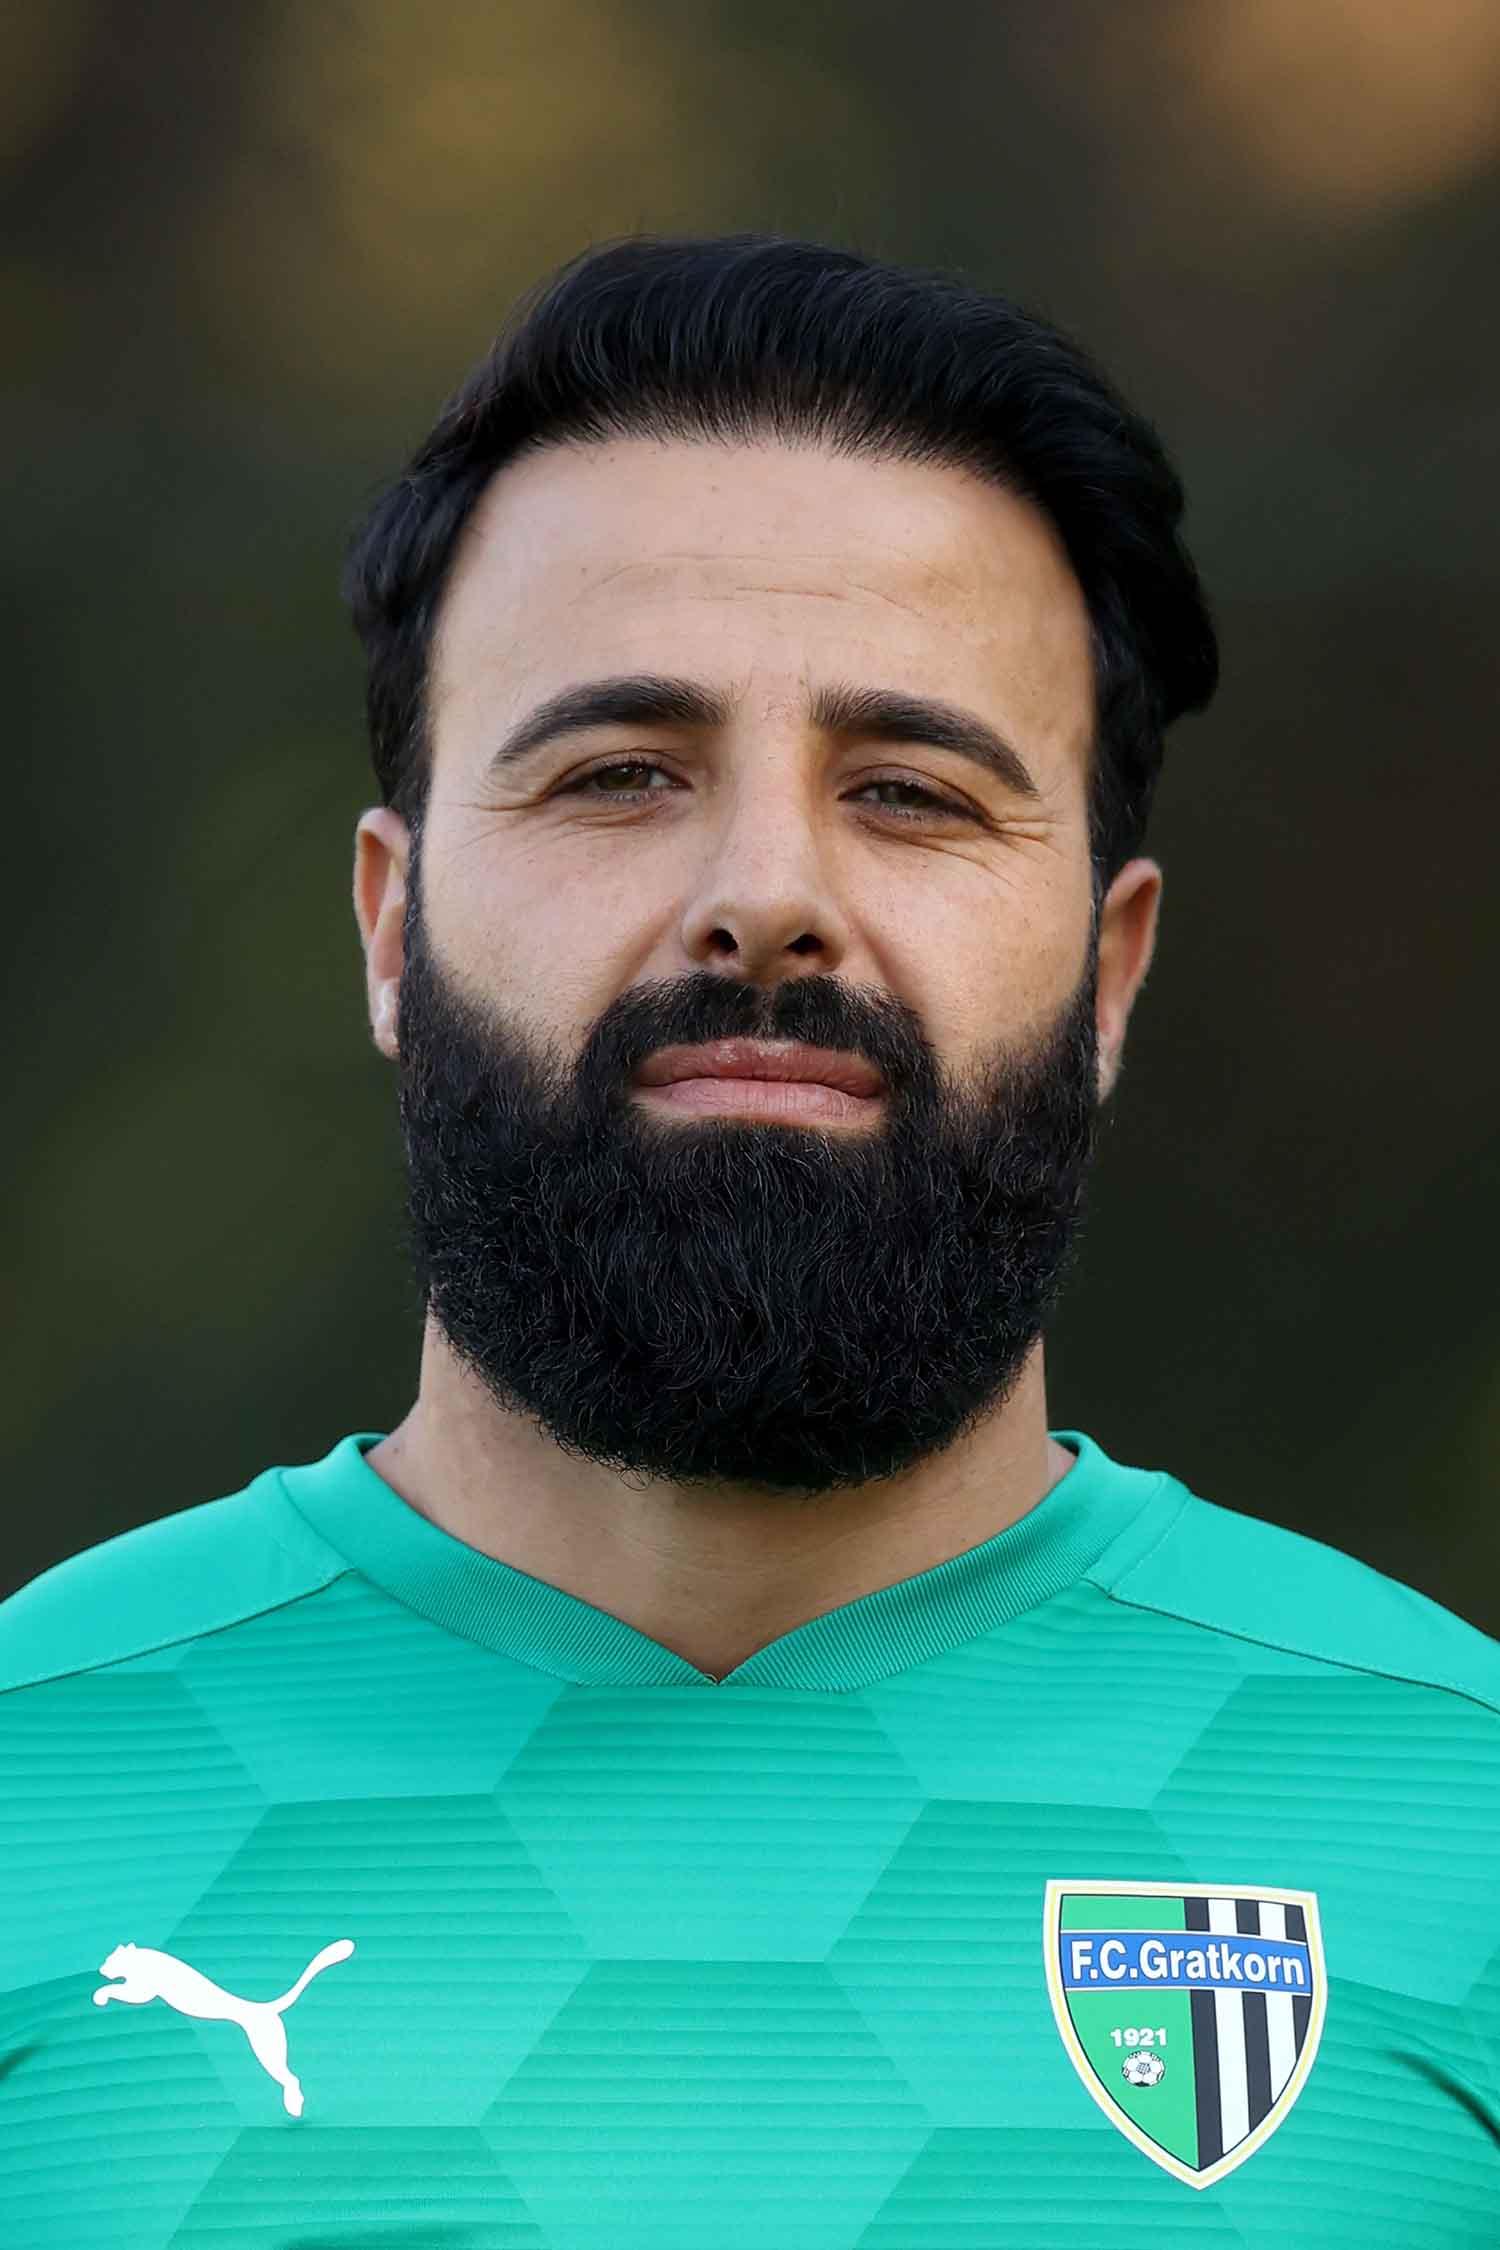 Coskun Akdag, Sturm FC Gratkorn